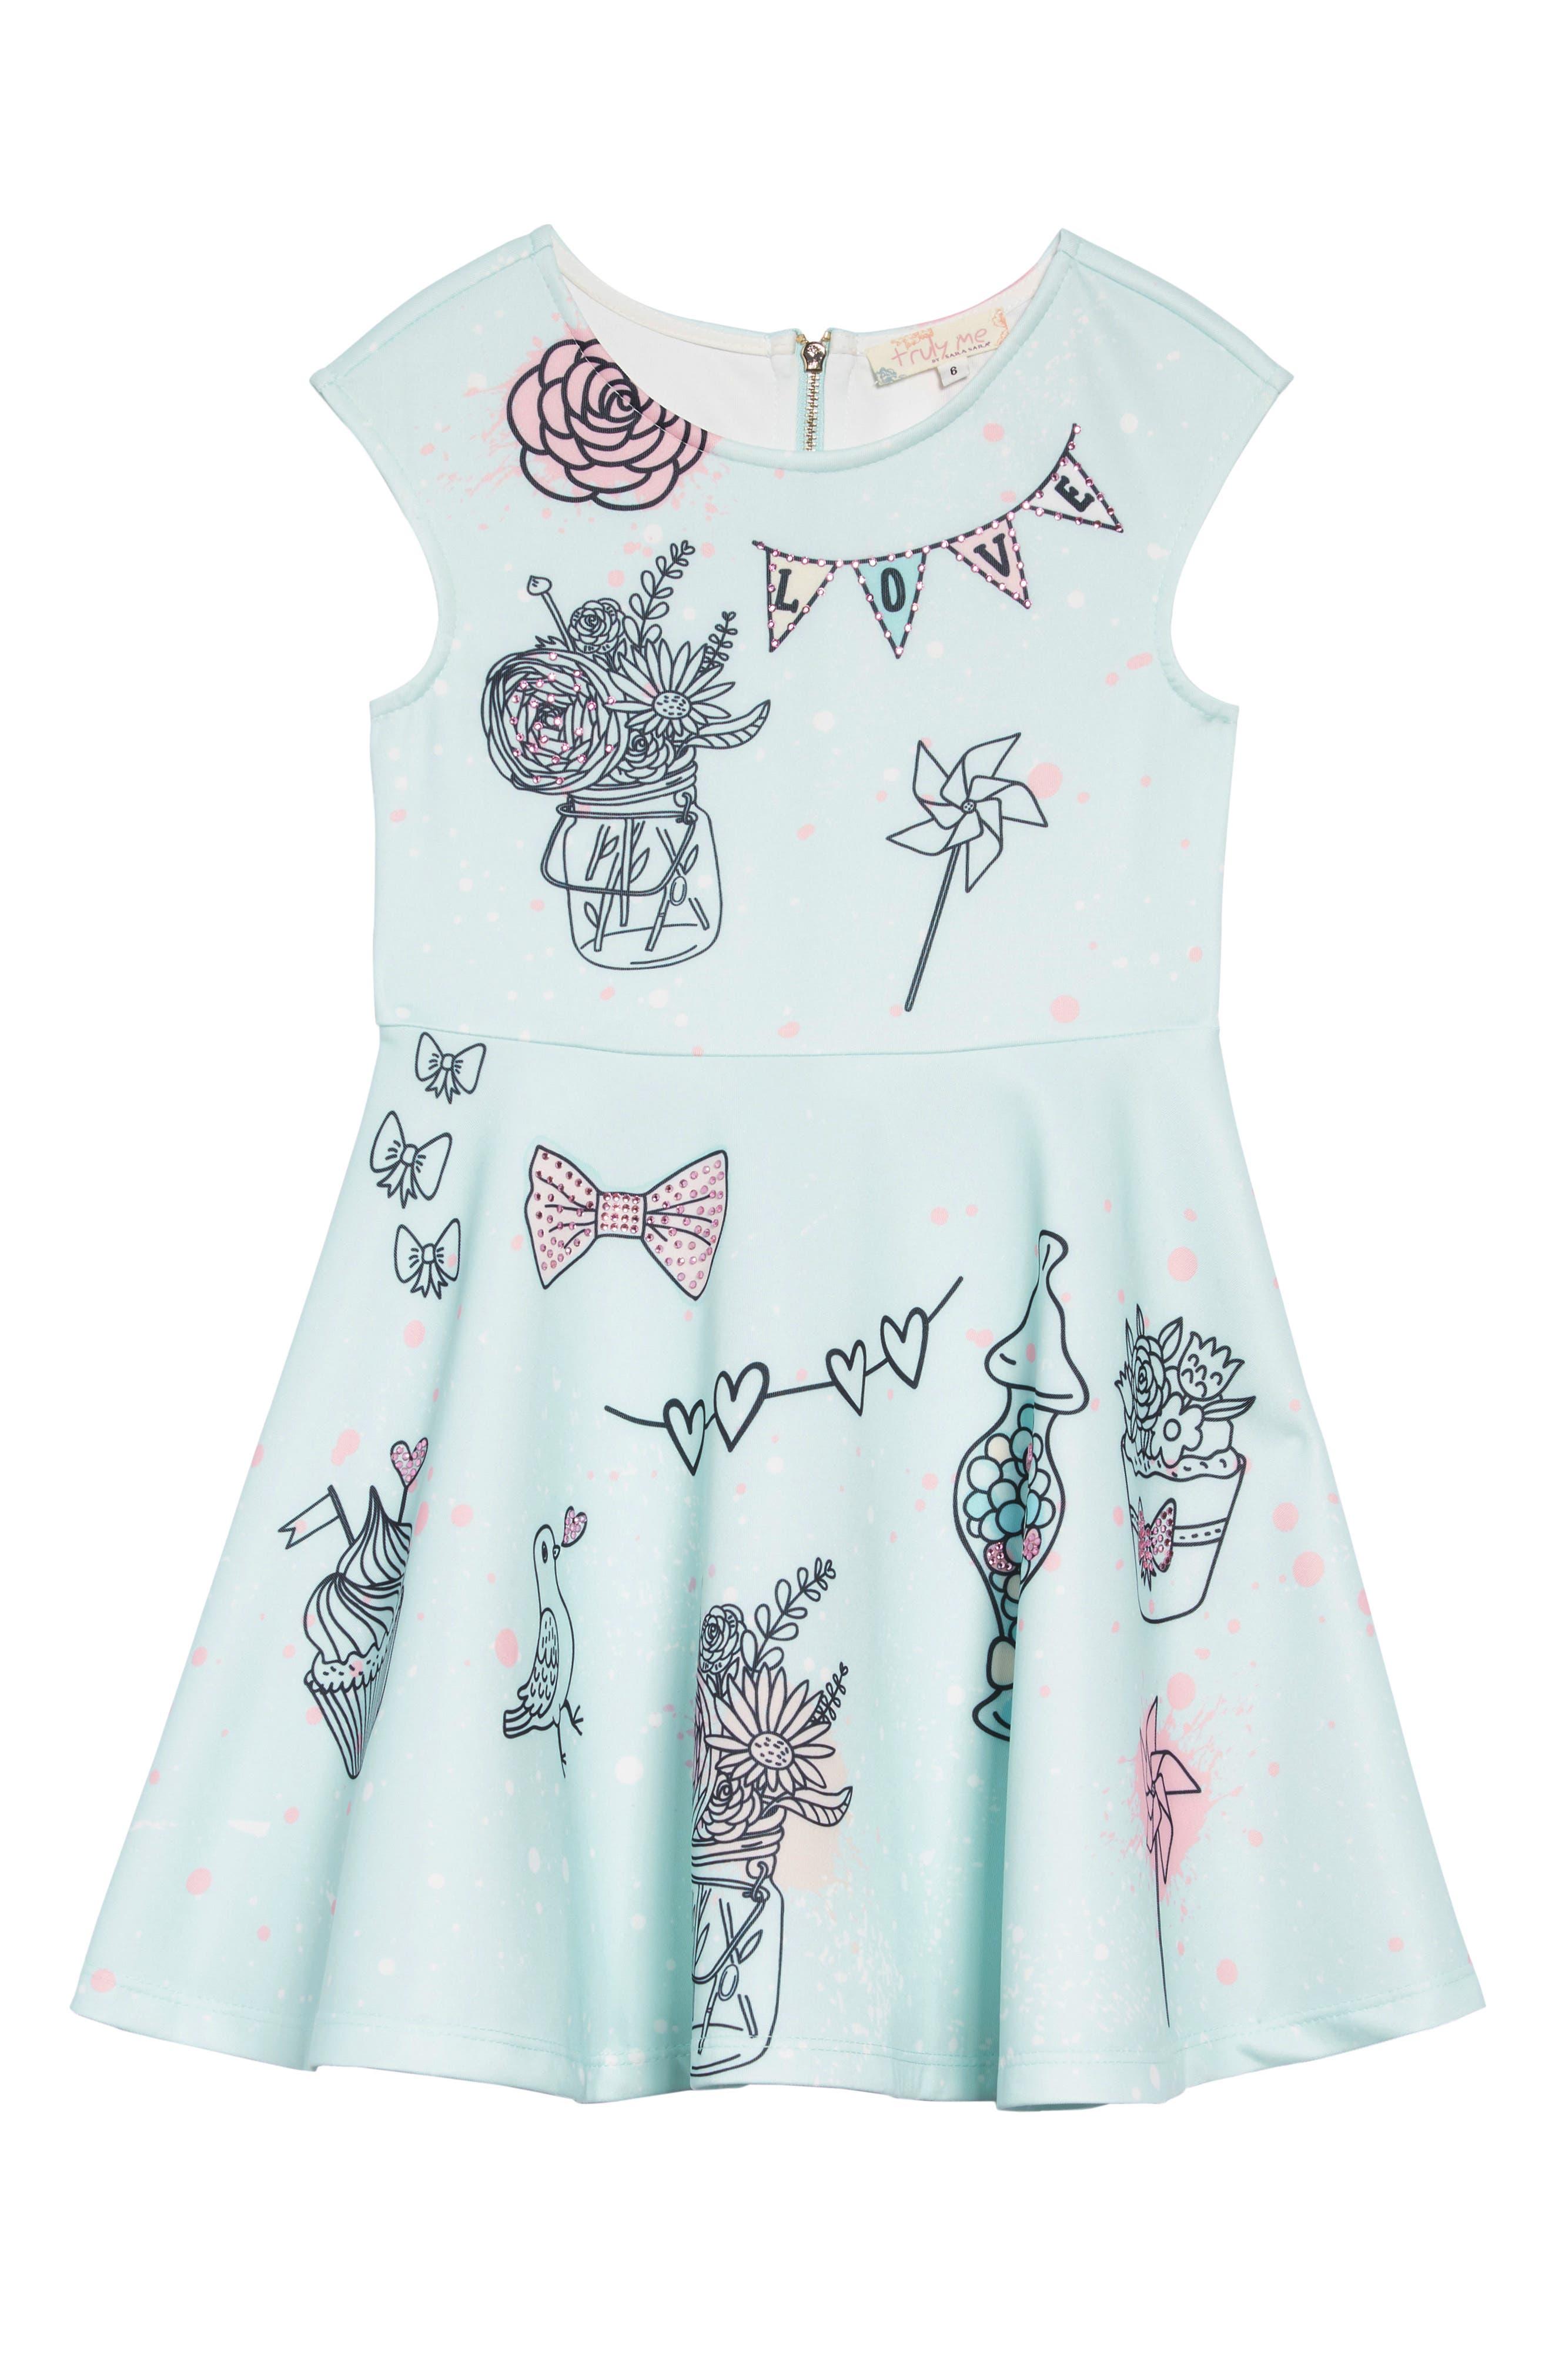 Whimsy Embellished Fit & Flare Dress,                             Main thumbnail 1, color,                             AQUA MULTI